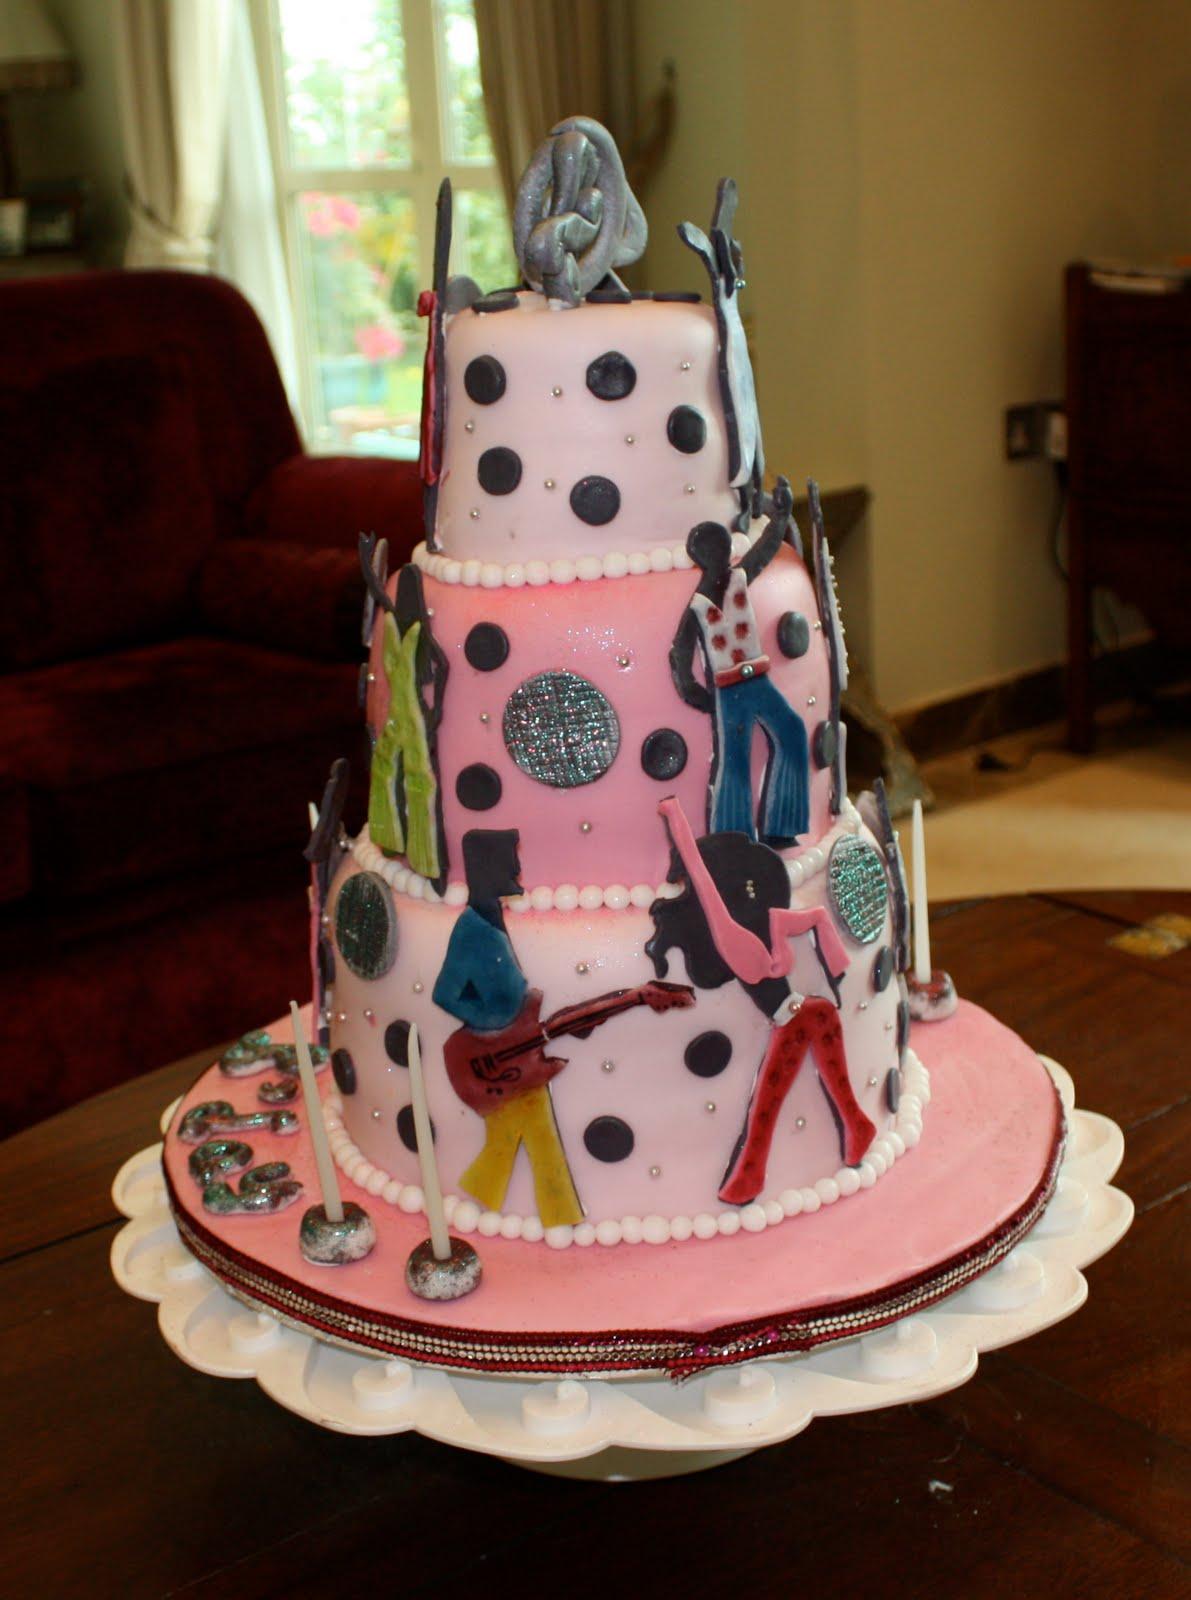 80 S Disco Theme Cake For 40 Something Birthday